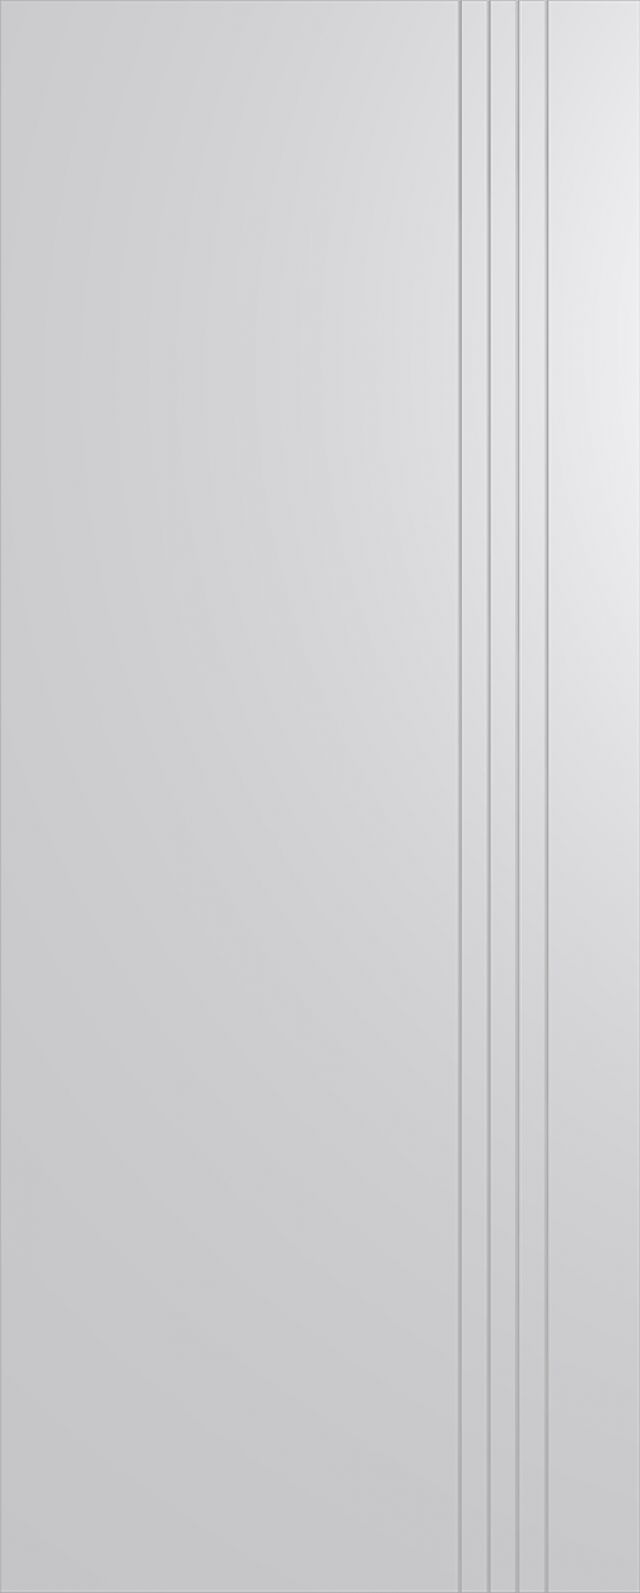 Hag9 Accent Hume Doors